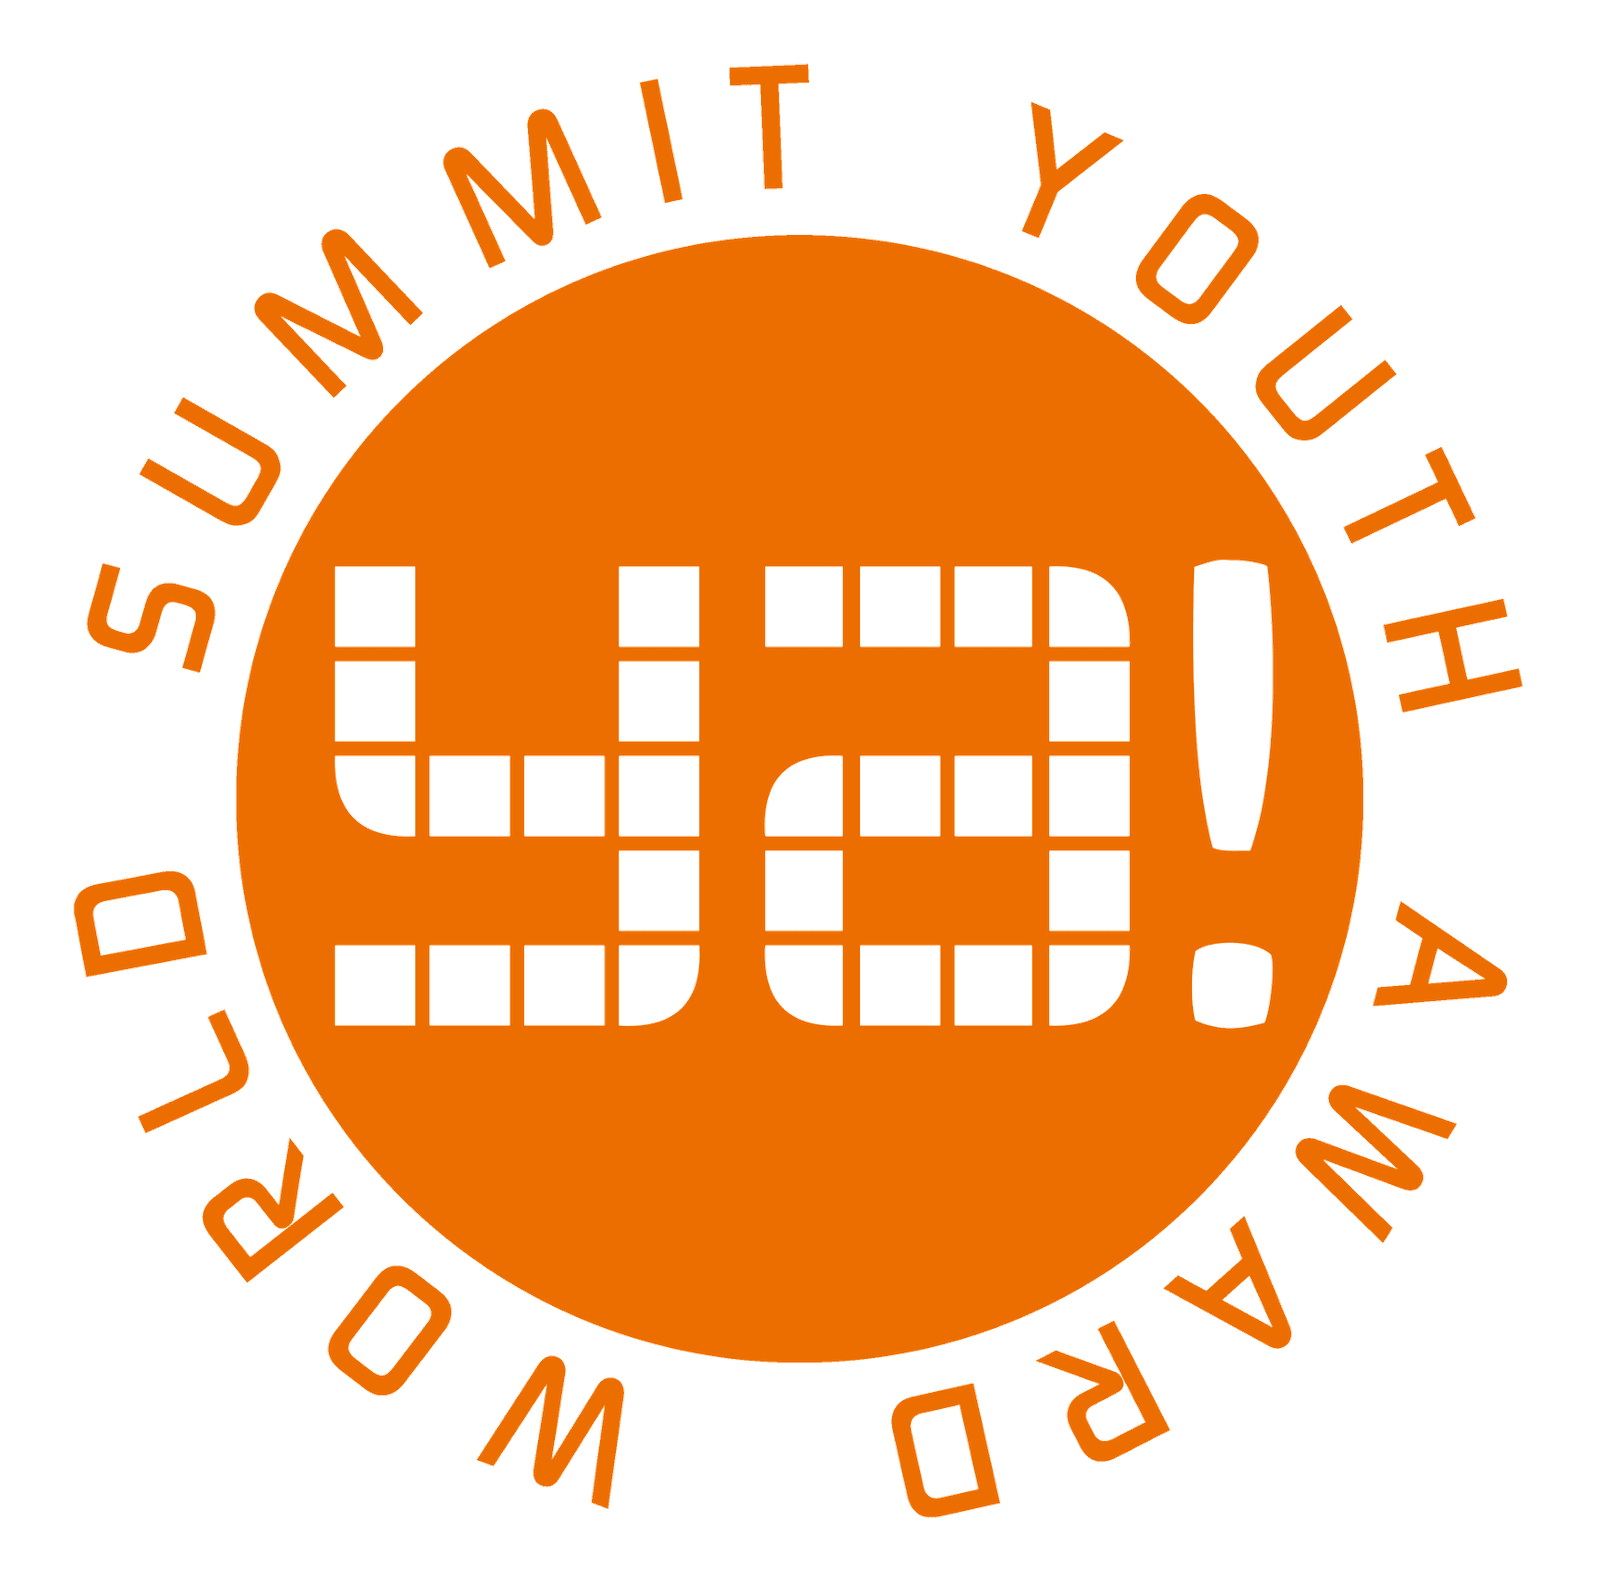 World-youth-summit-award-2013